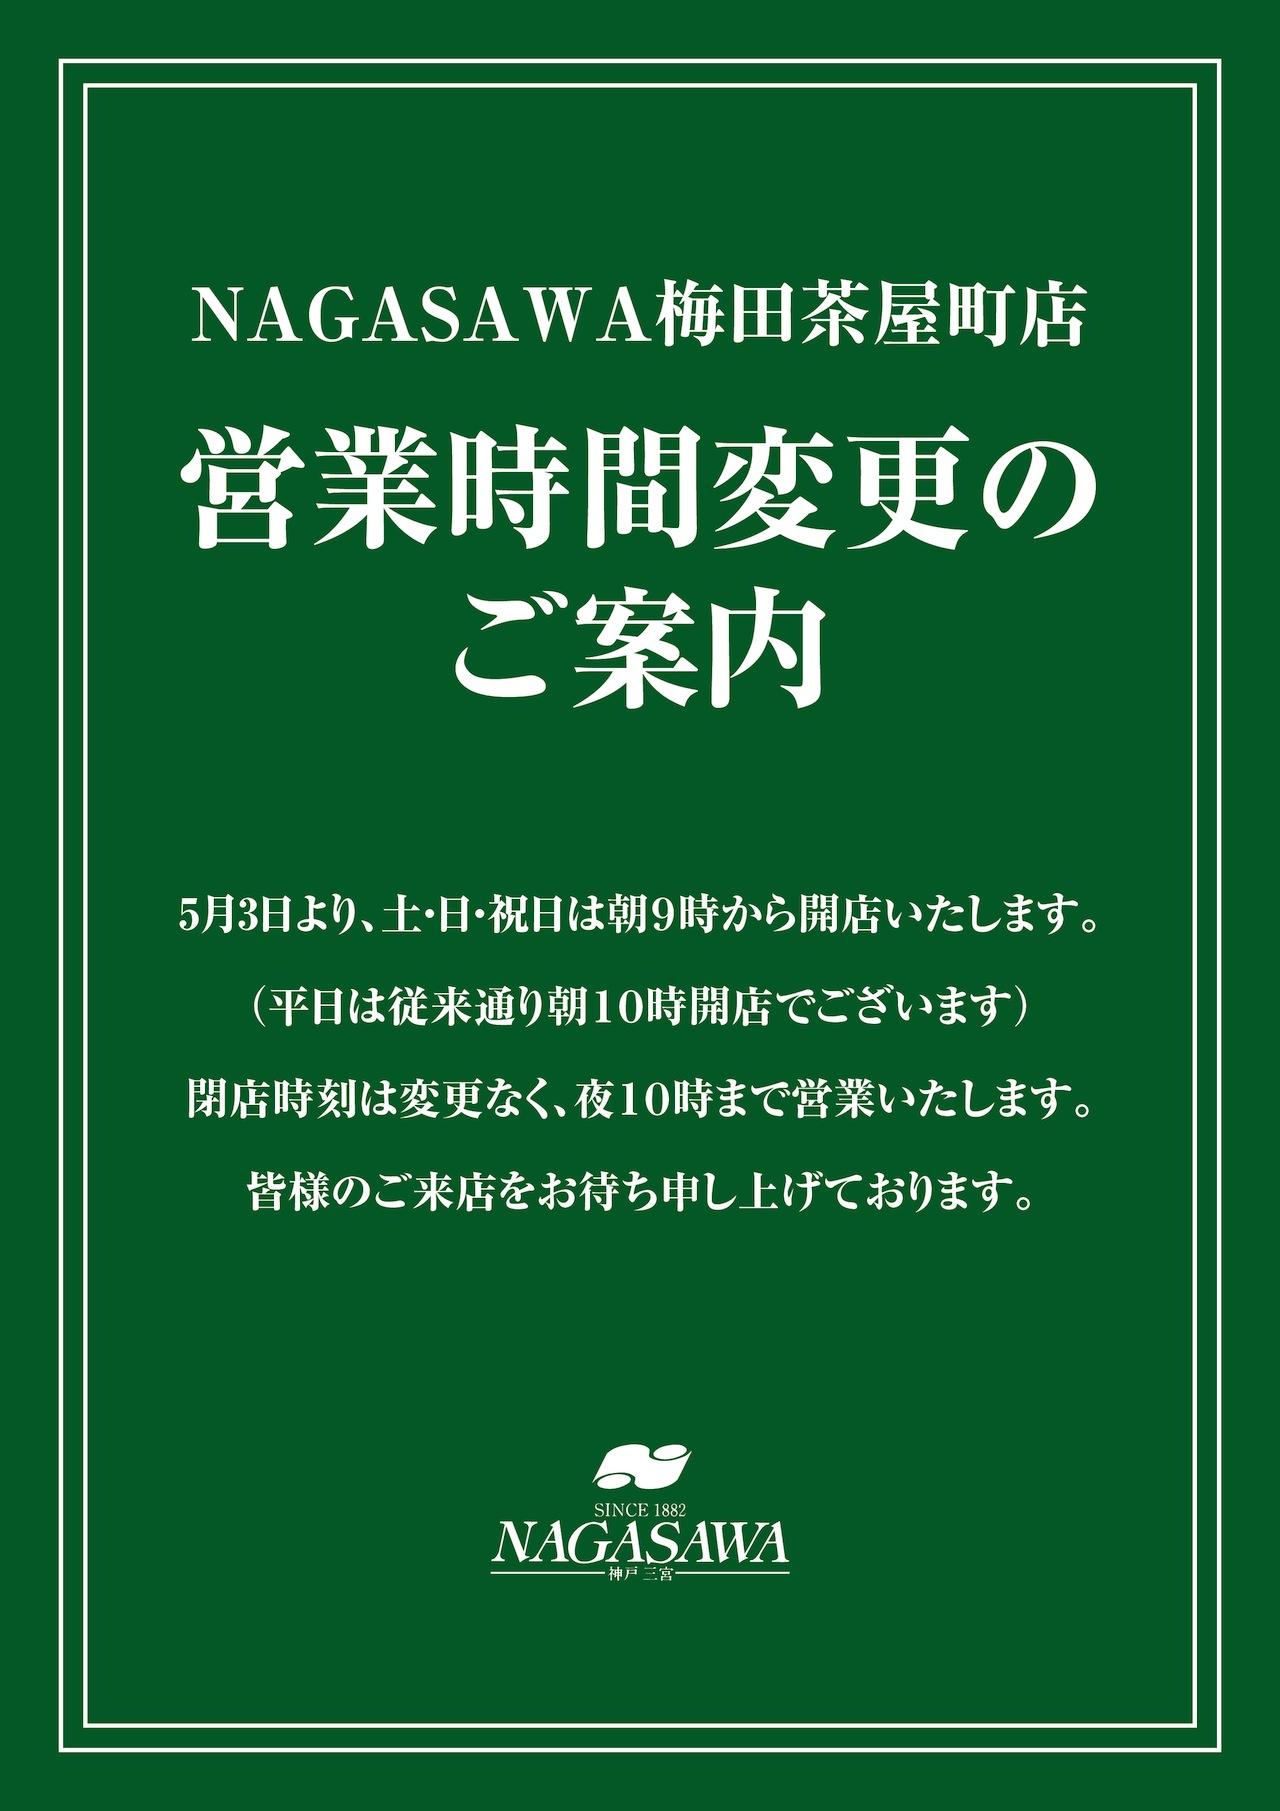 NAGASAWA梅田茶屋町店 営業時間変更のお知らせ